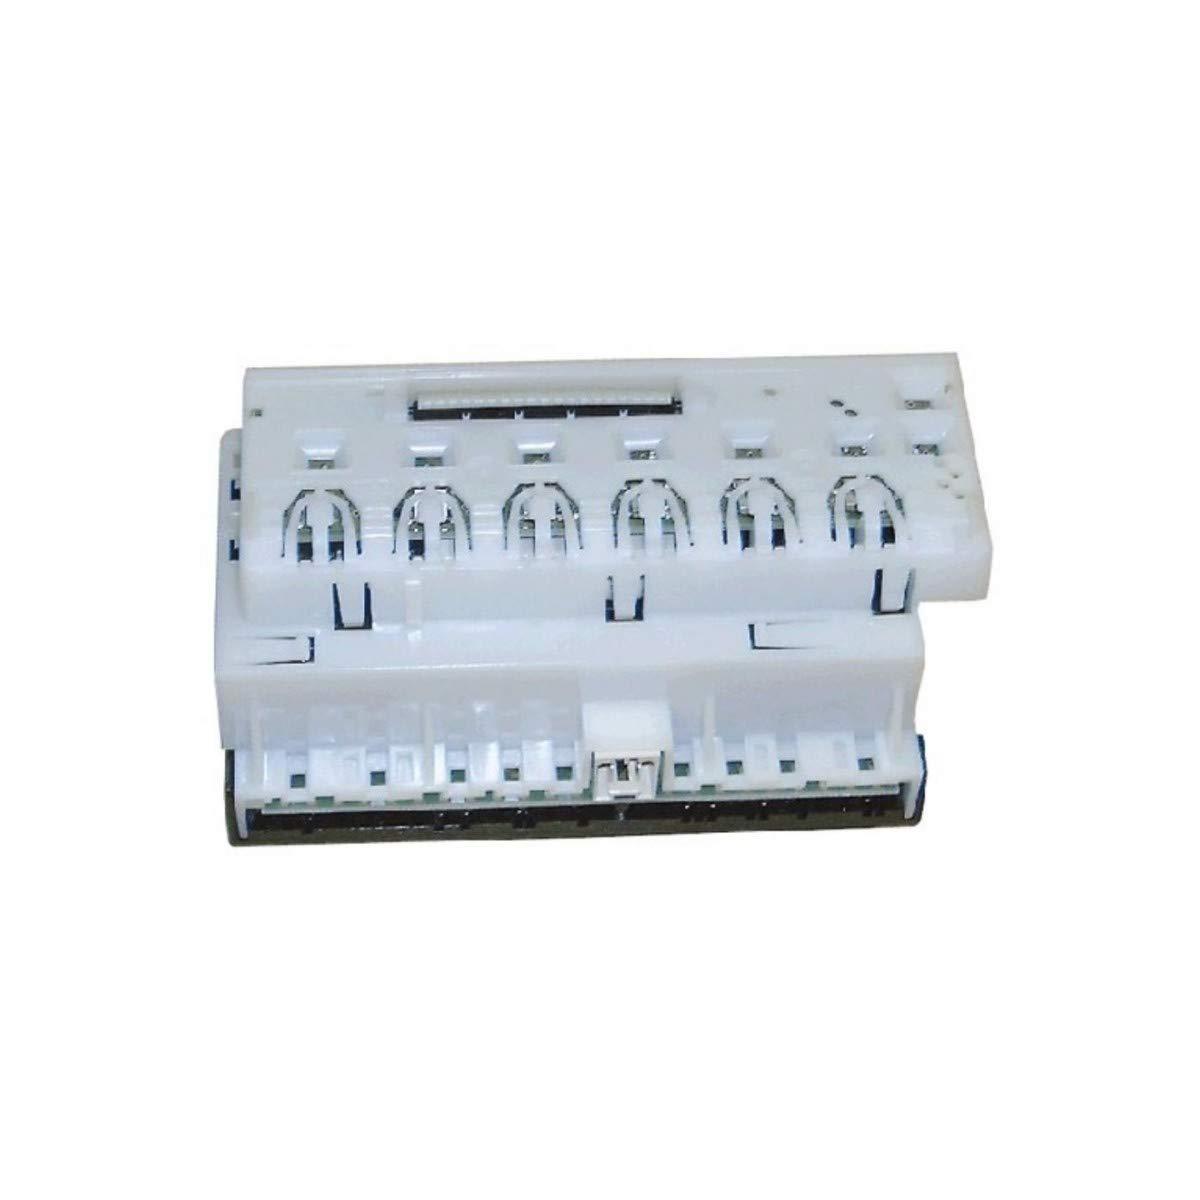 Modulo electronico lavavajillas Bosch SGI5330/17 269965 ...